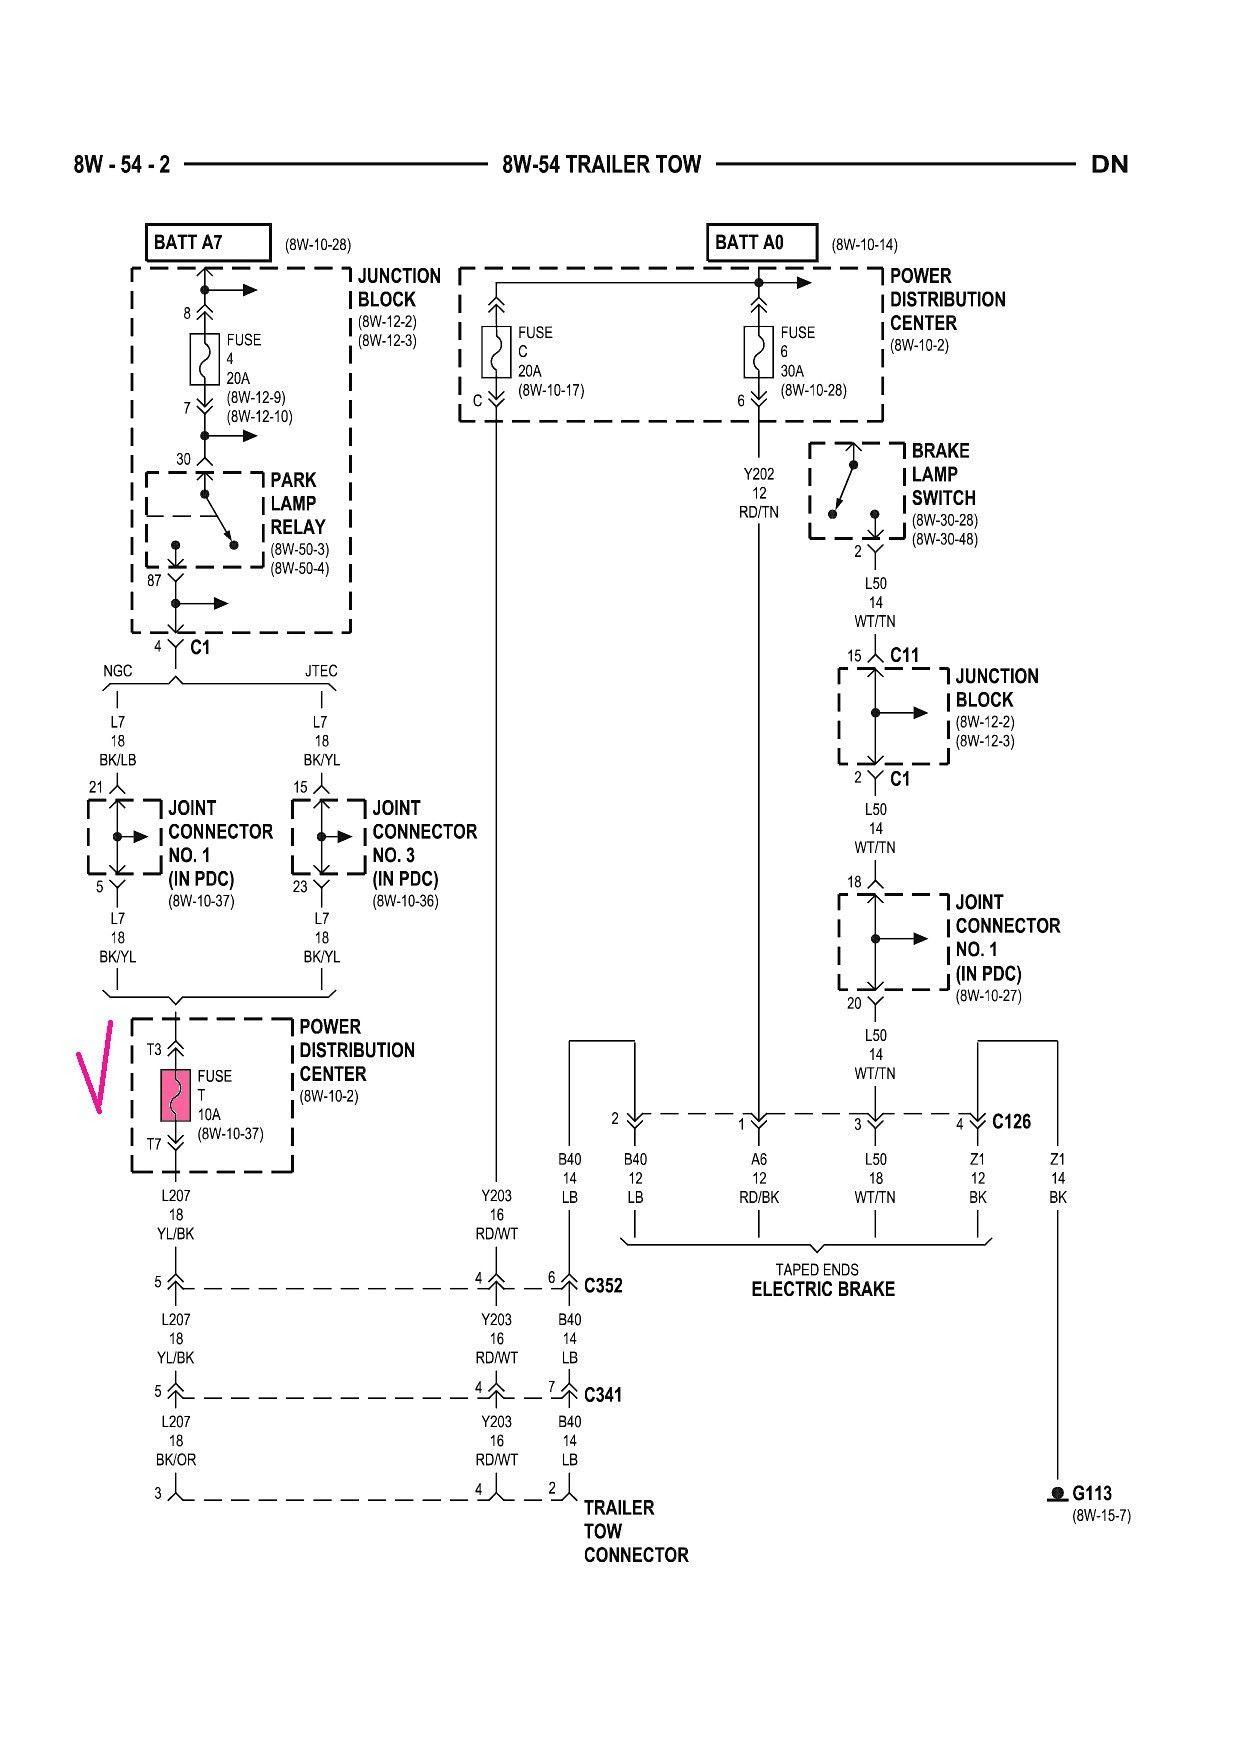 New 1998 Dodge Ram 1500 Trailer Wiring Diagram Diagram Diagramsample Diagramtemplate Wiringdiagram Diagramchart Worksheet Wor Dodge Dakota Diagram Dodge